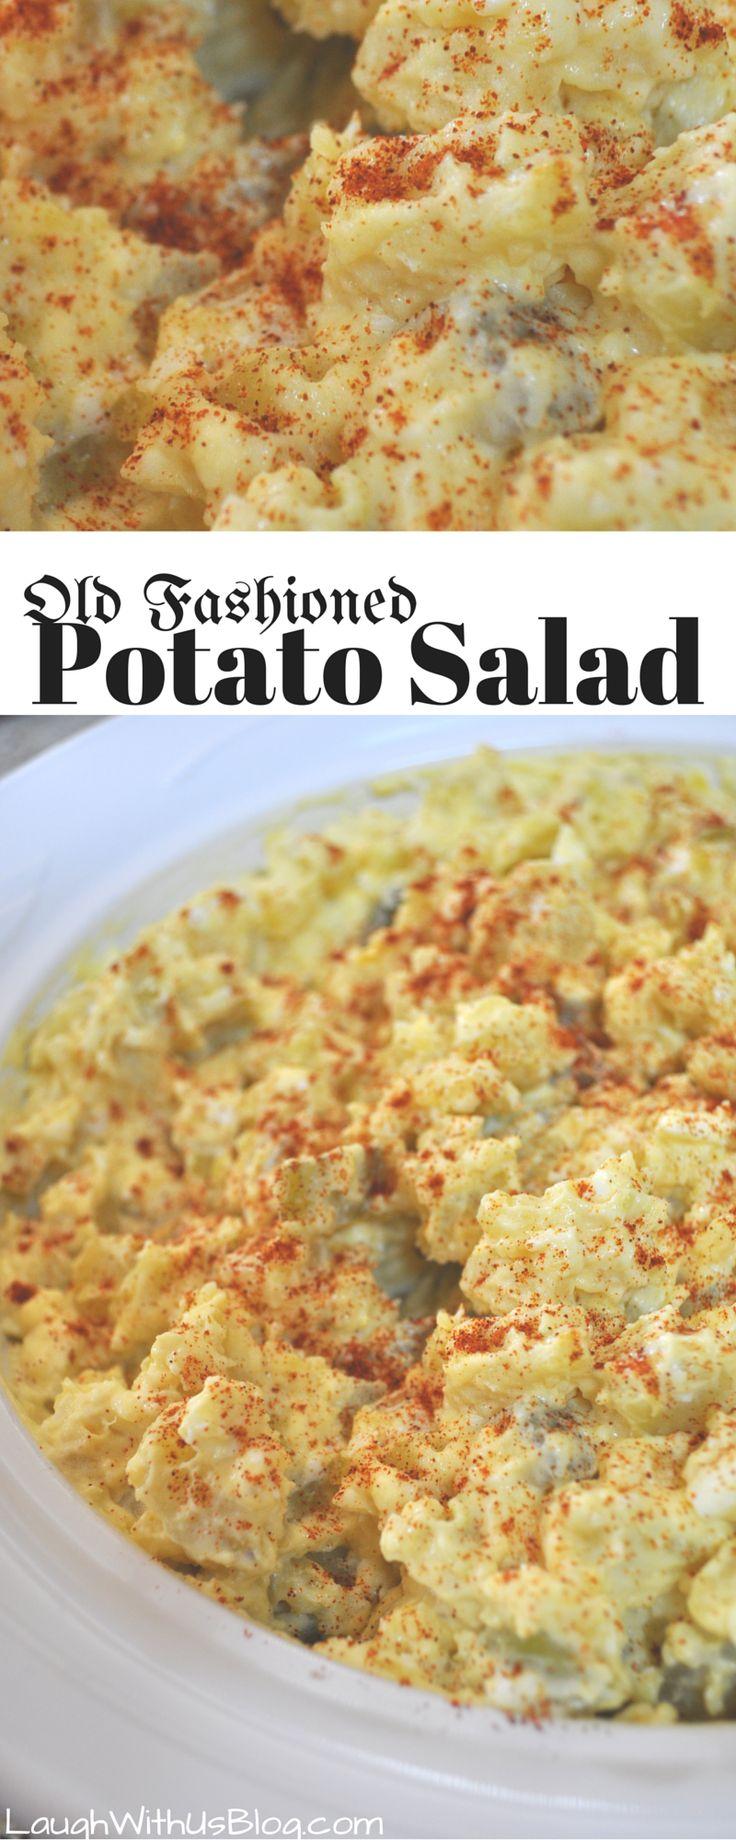 Best old fashioned potato salad recipe